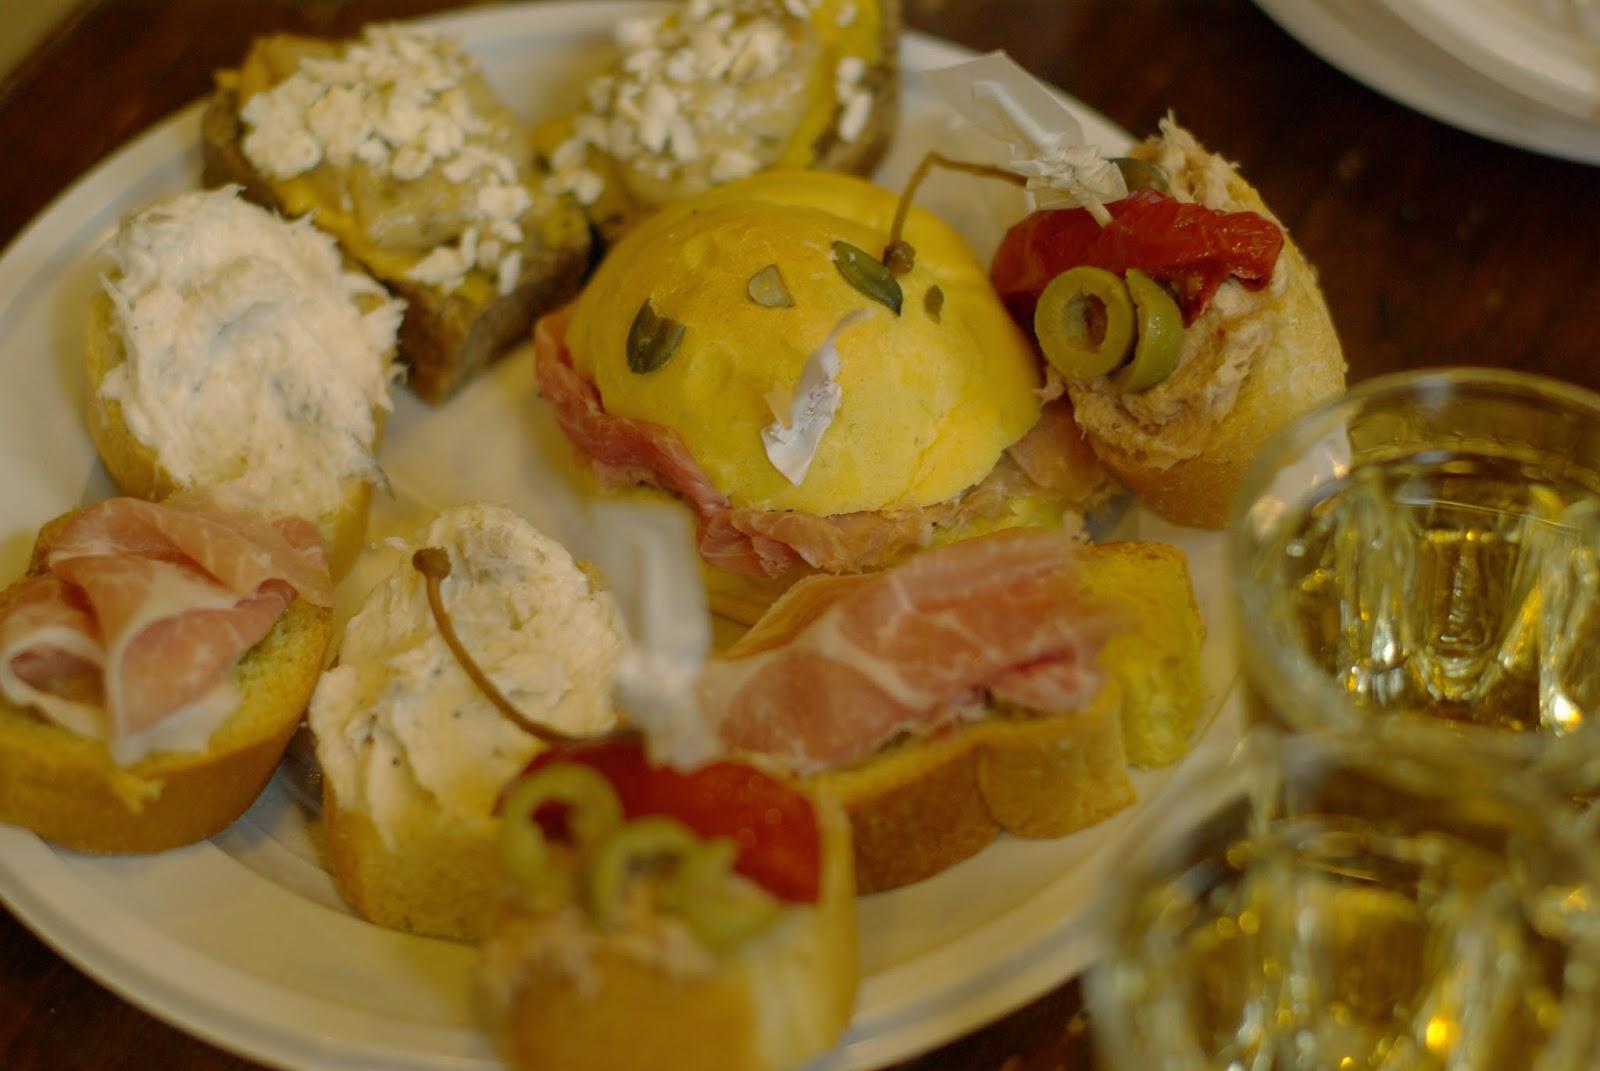 van-en-vadrouille-osteria-alsquero-venise-crostini